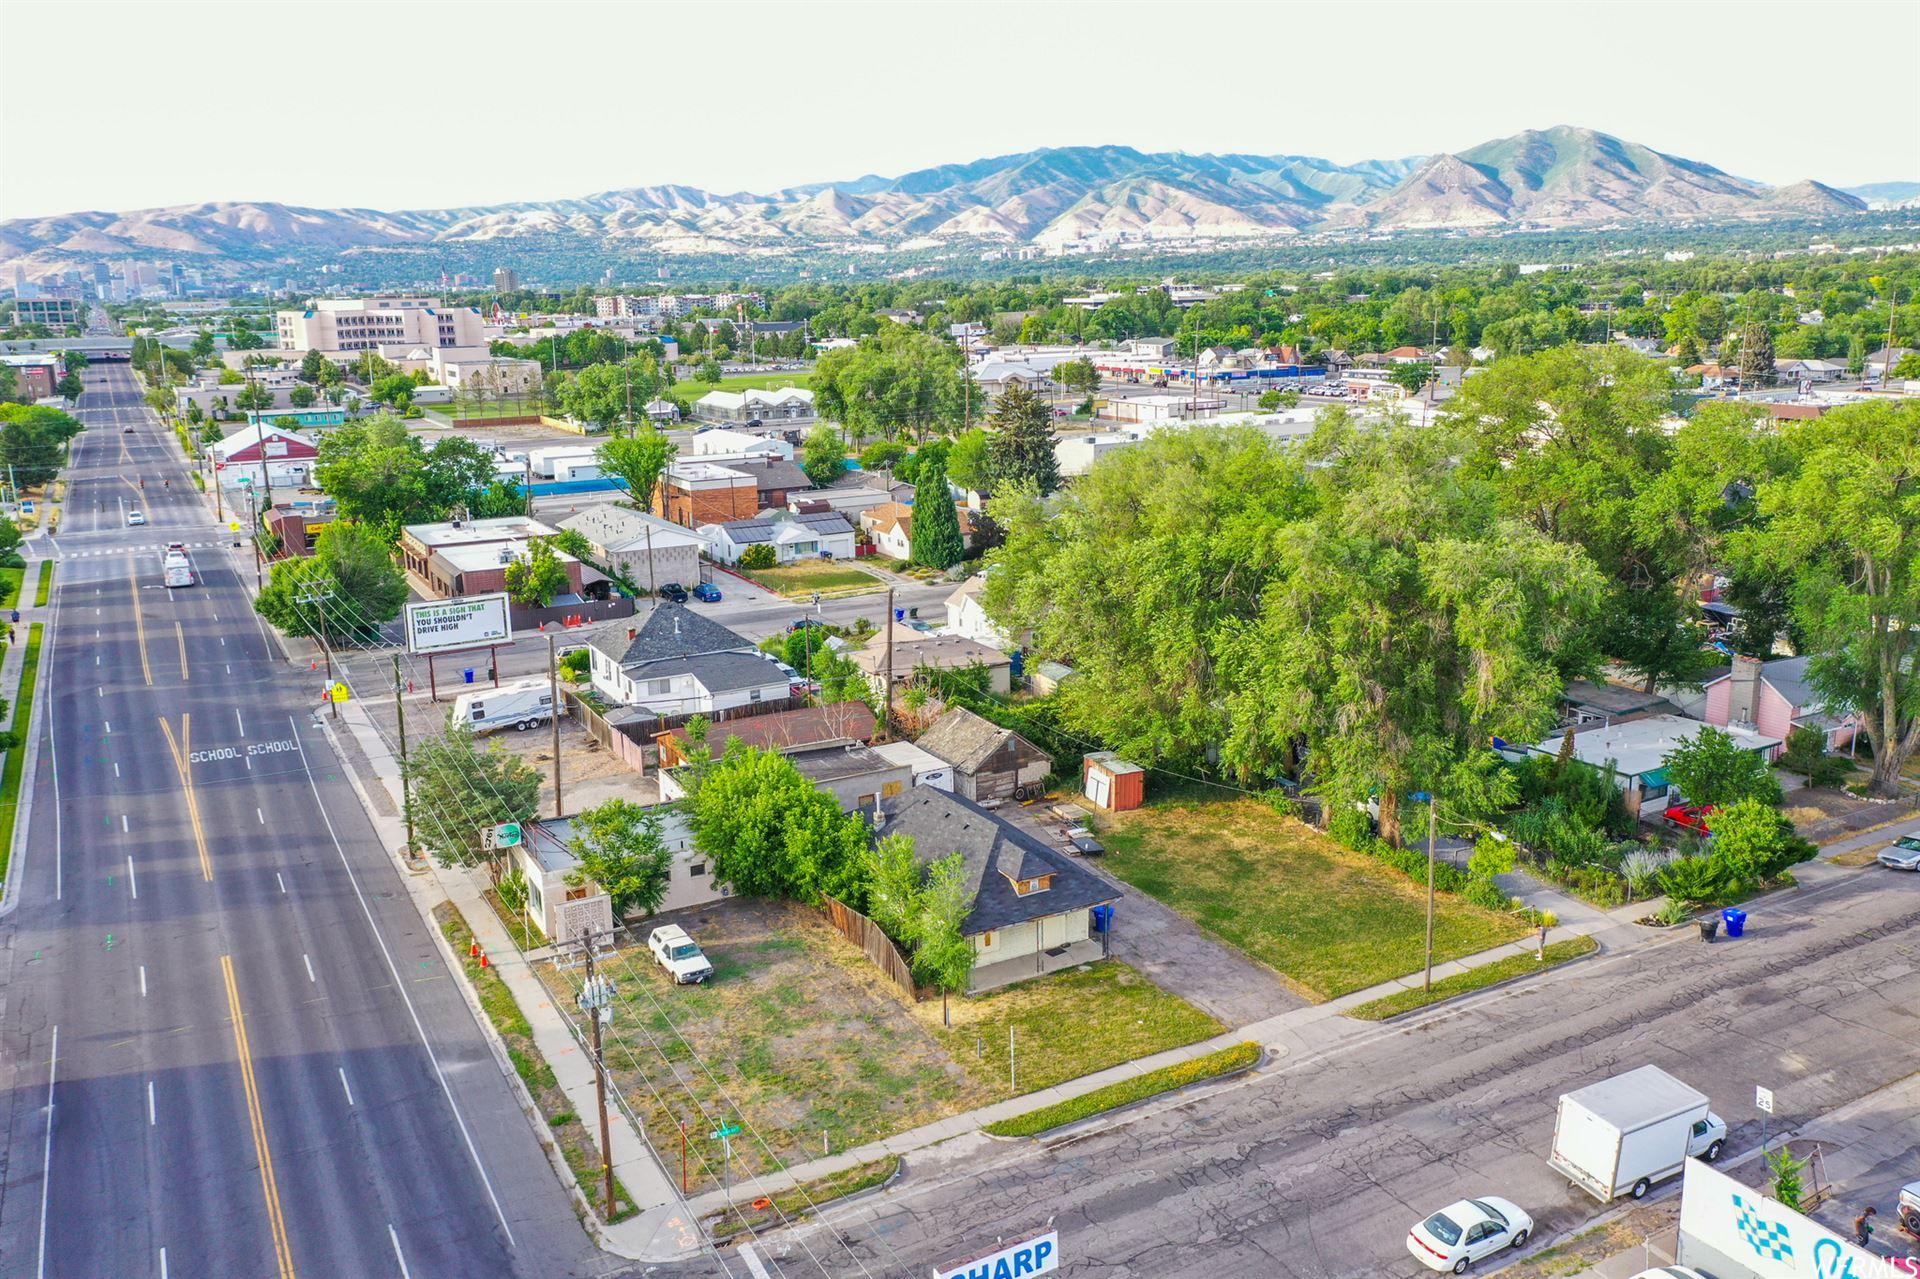 Photo of 2761 MAIN S ST, South Salt Lake, UT 84115 (MLS # 1770412)